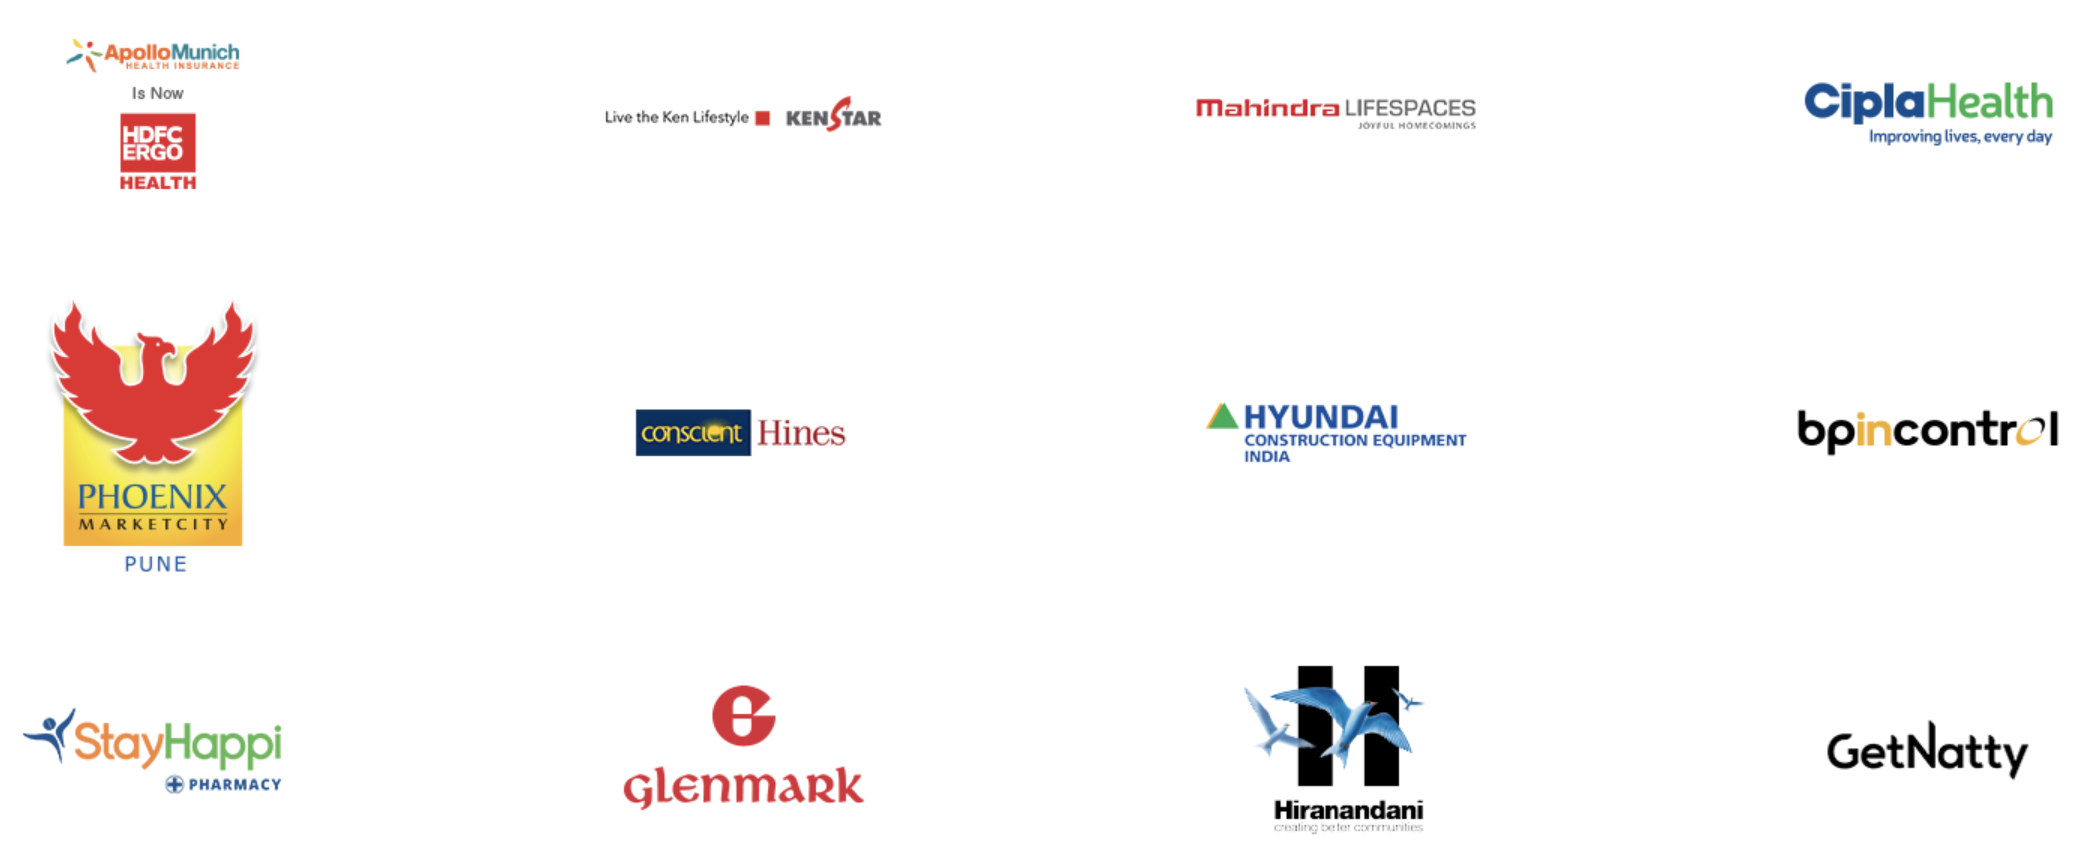 Amura Clients - Digital Marketing Agencies in Pune